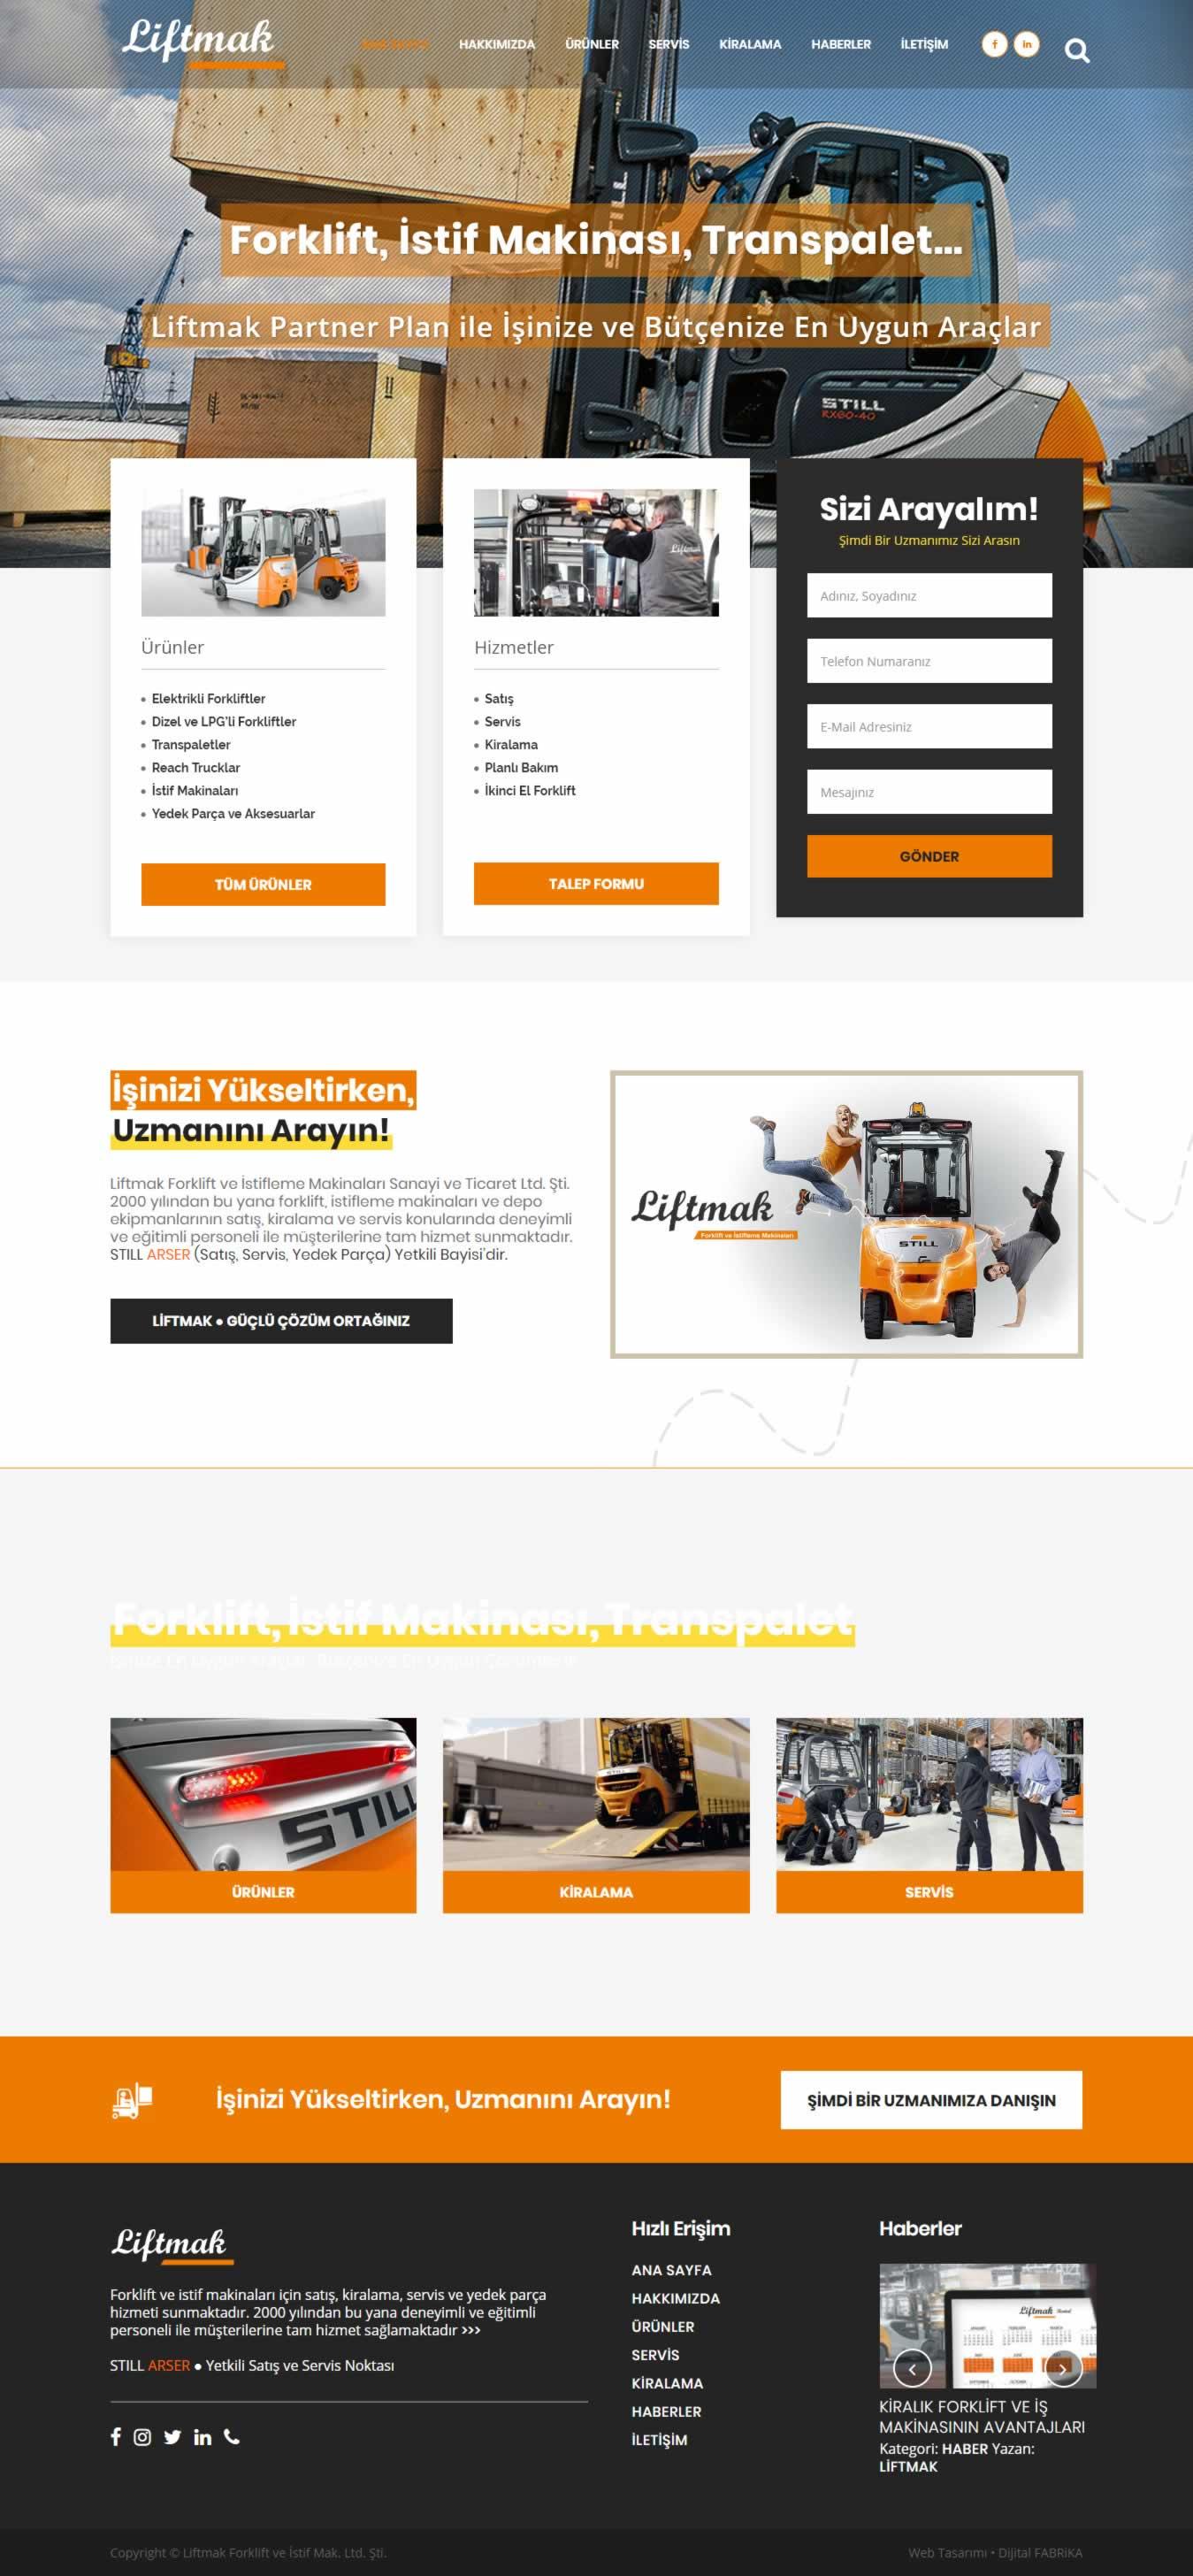 liftmak.com.tr web sitesi